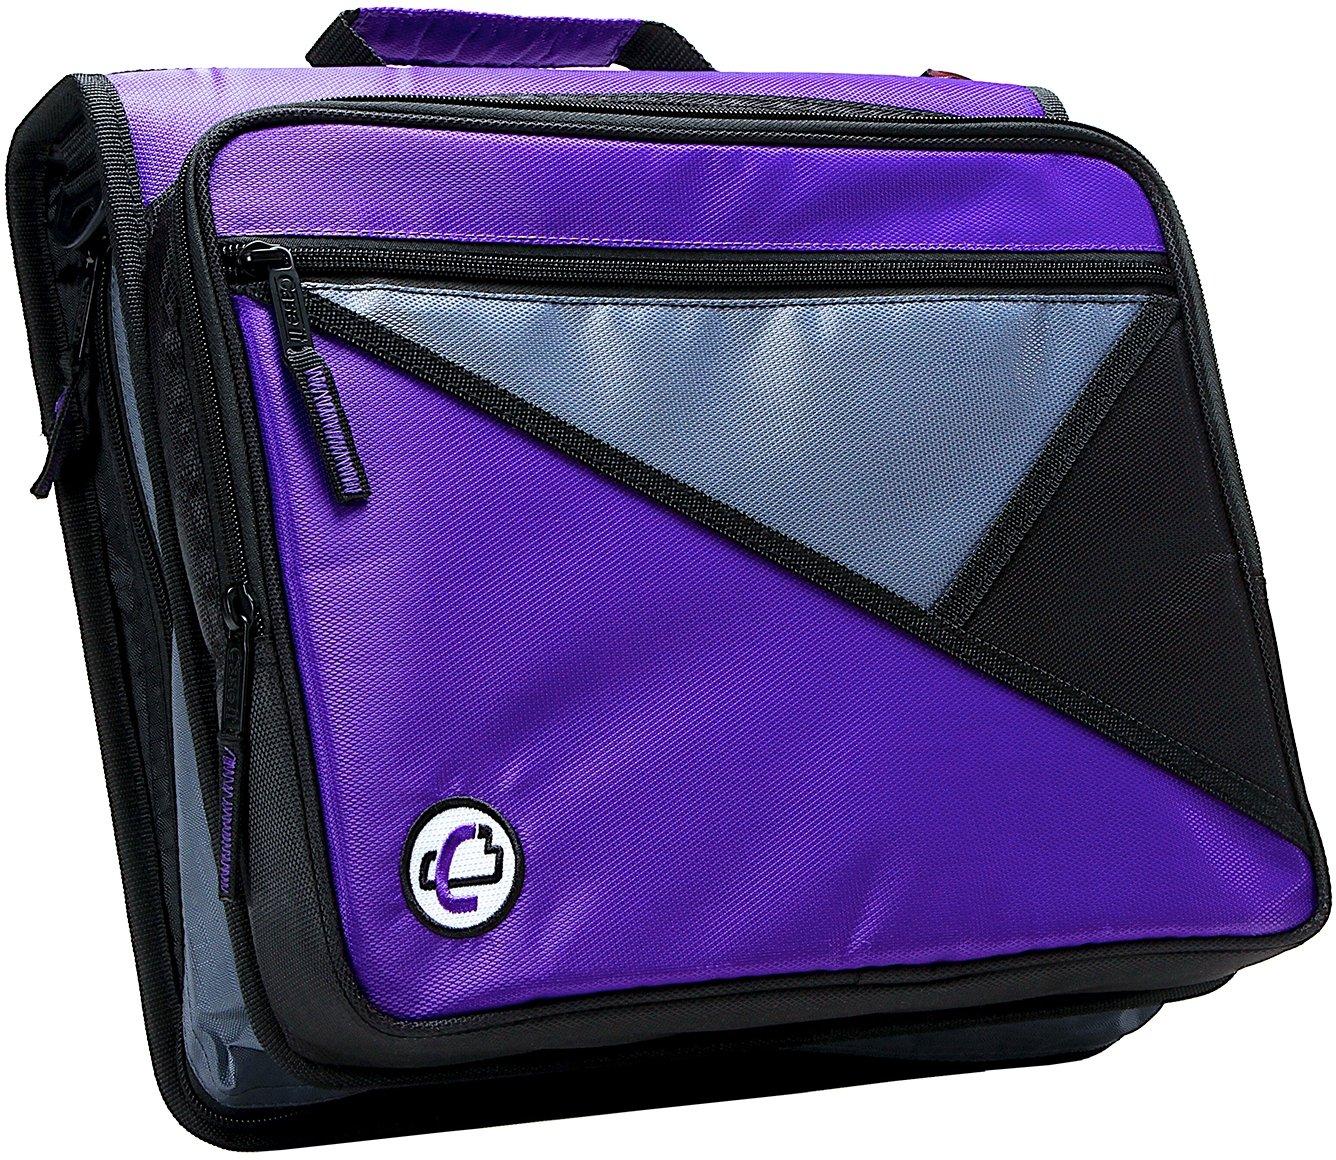 Case-it Universal 2-Inch 3-Ring Zipper Binder, Holds 13 Inch Laptop, Purple, LT-007-PUR